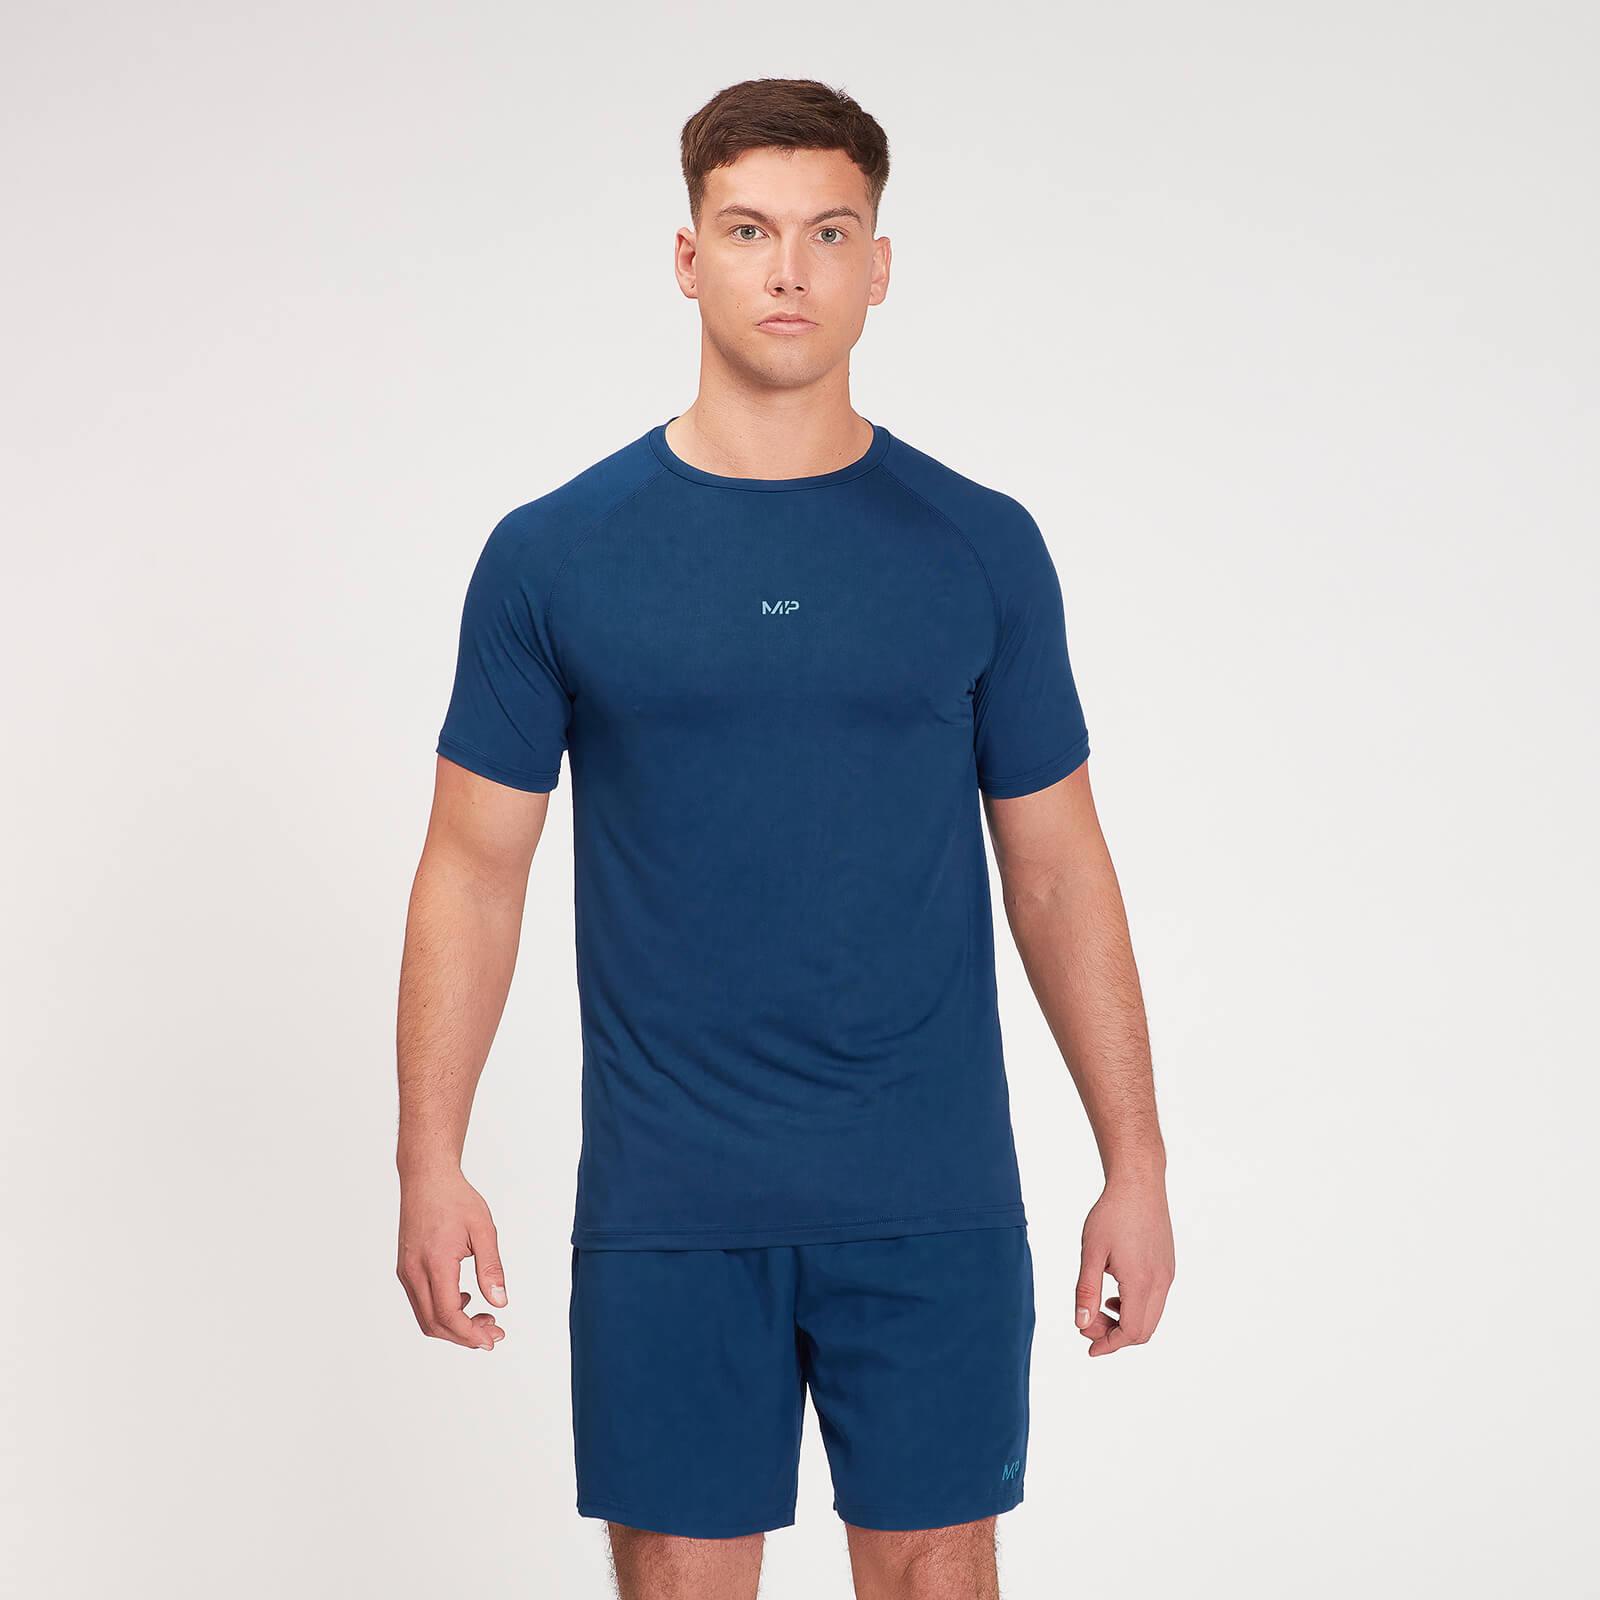 Купить Мужская футболка с короткими рукавами MP Graphic Training - XL, Myprotein International